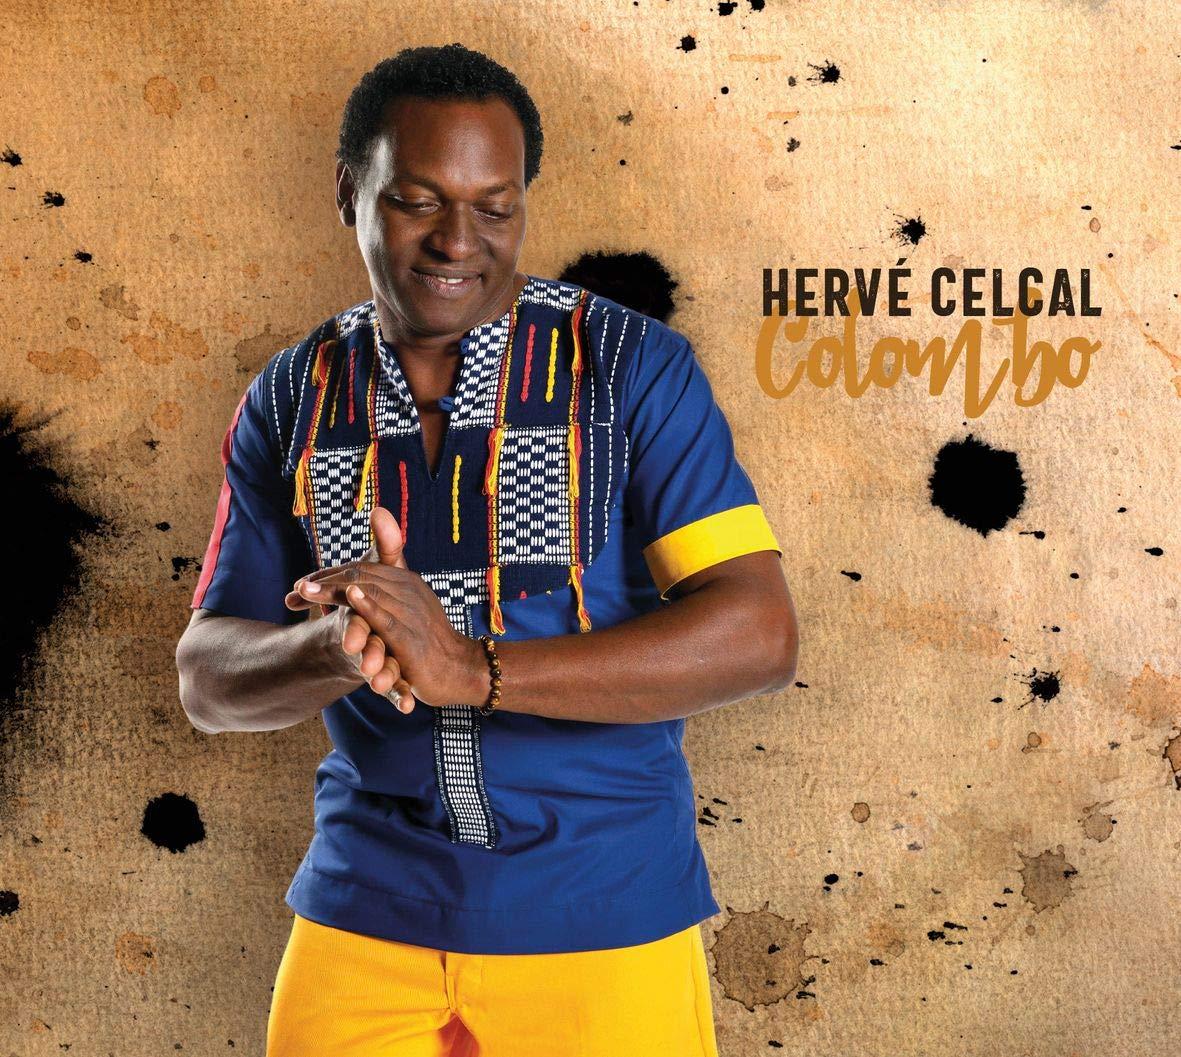 Celcal, Herve - Colombo - Amazon.com Music